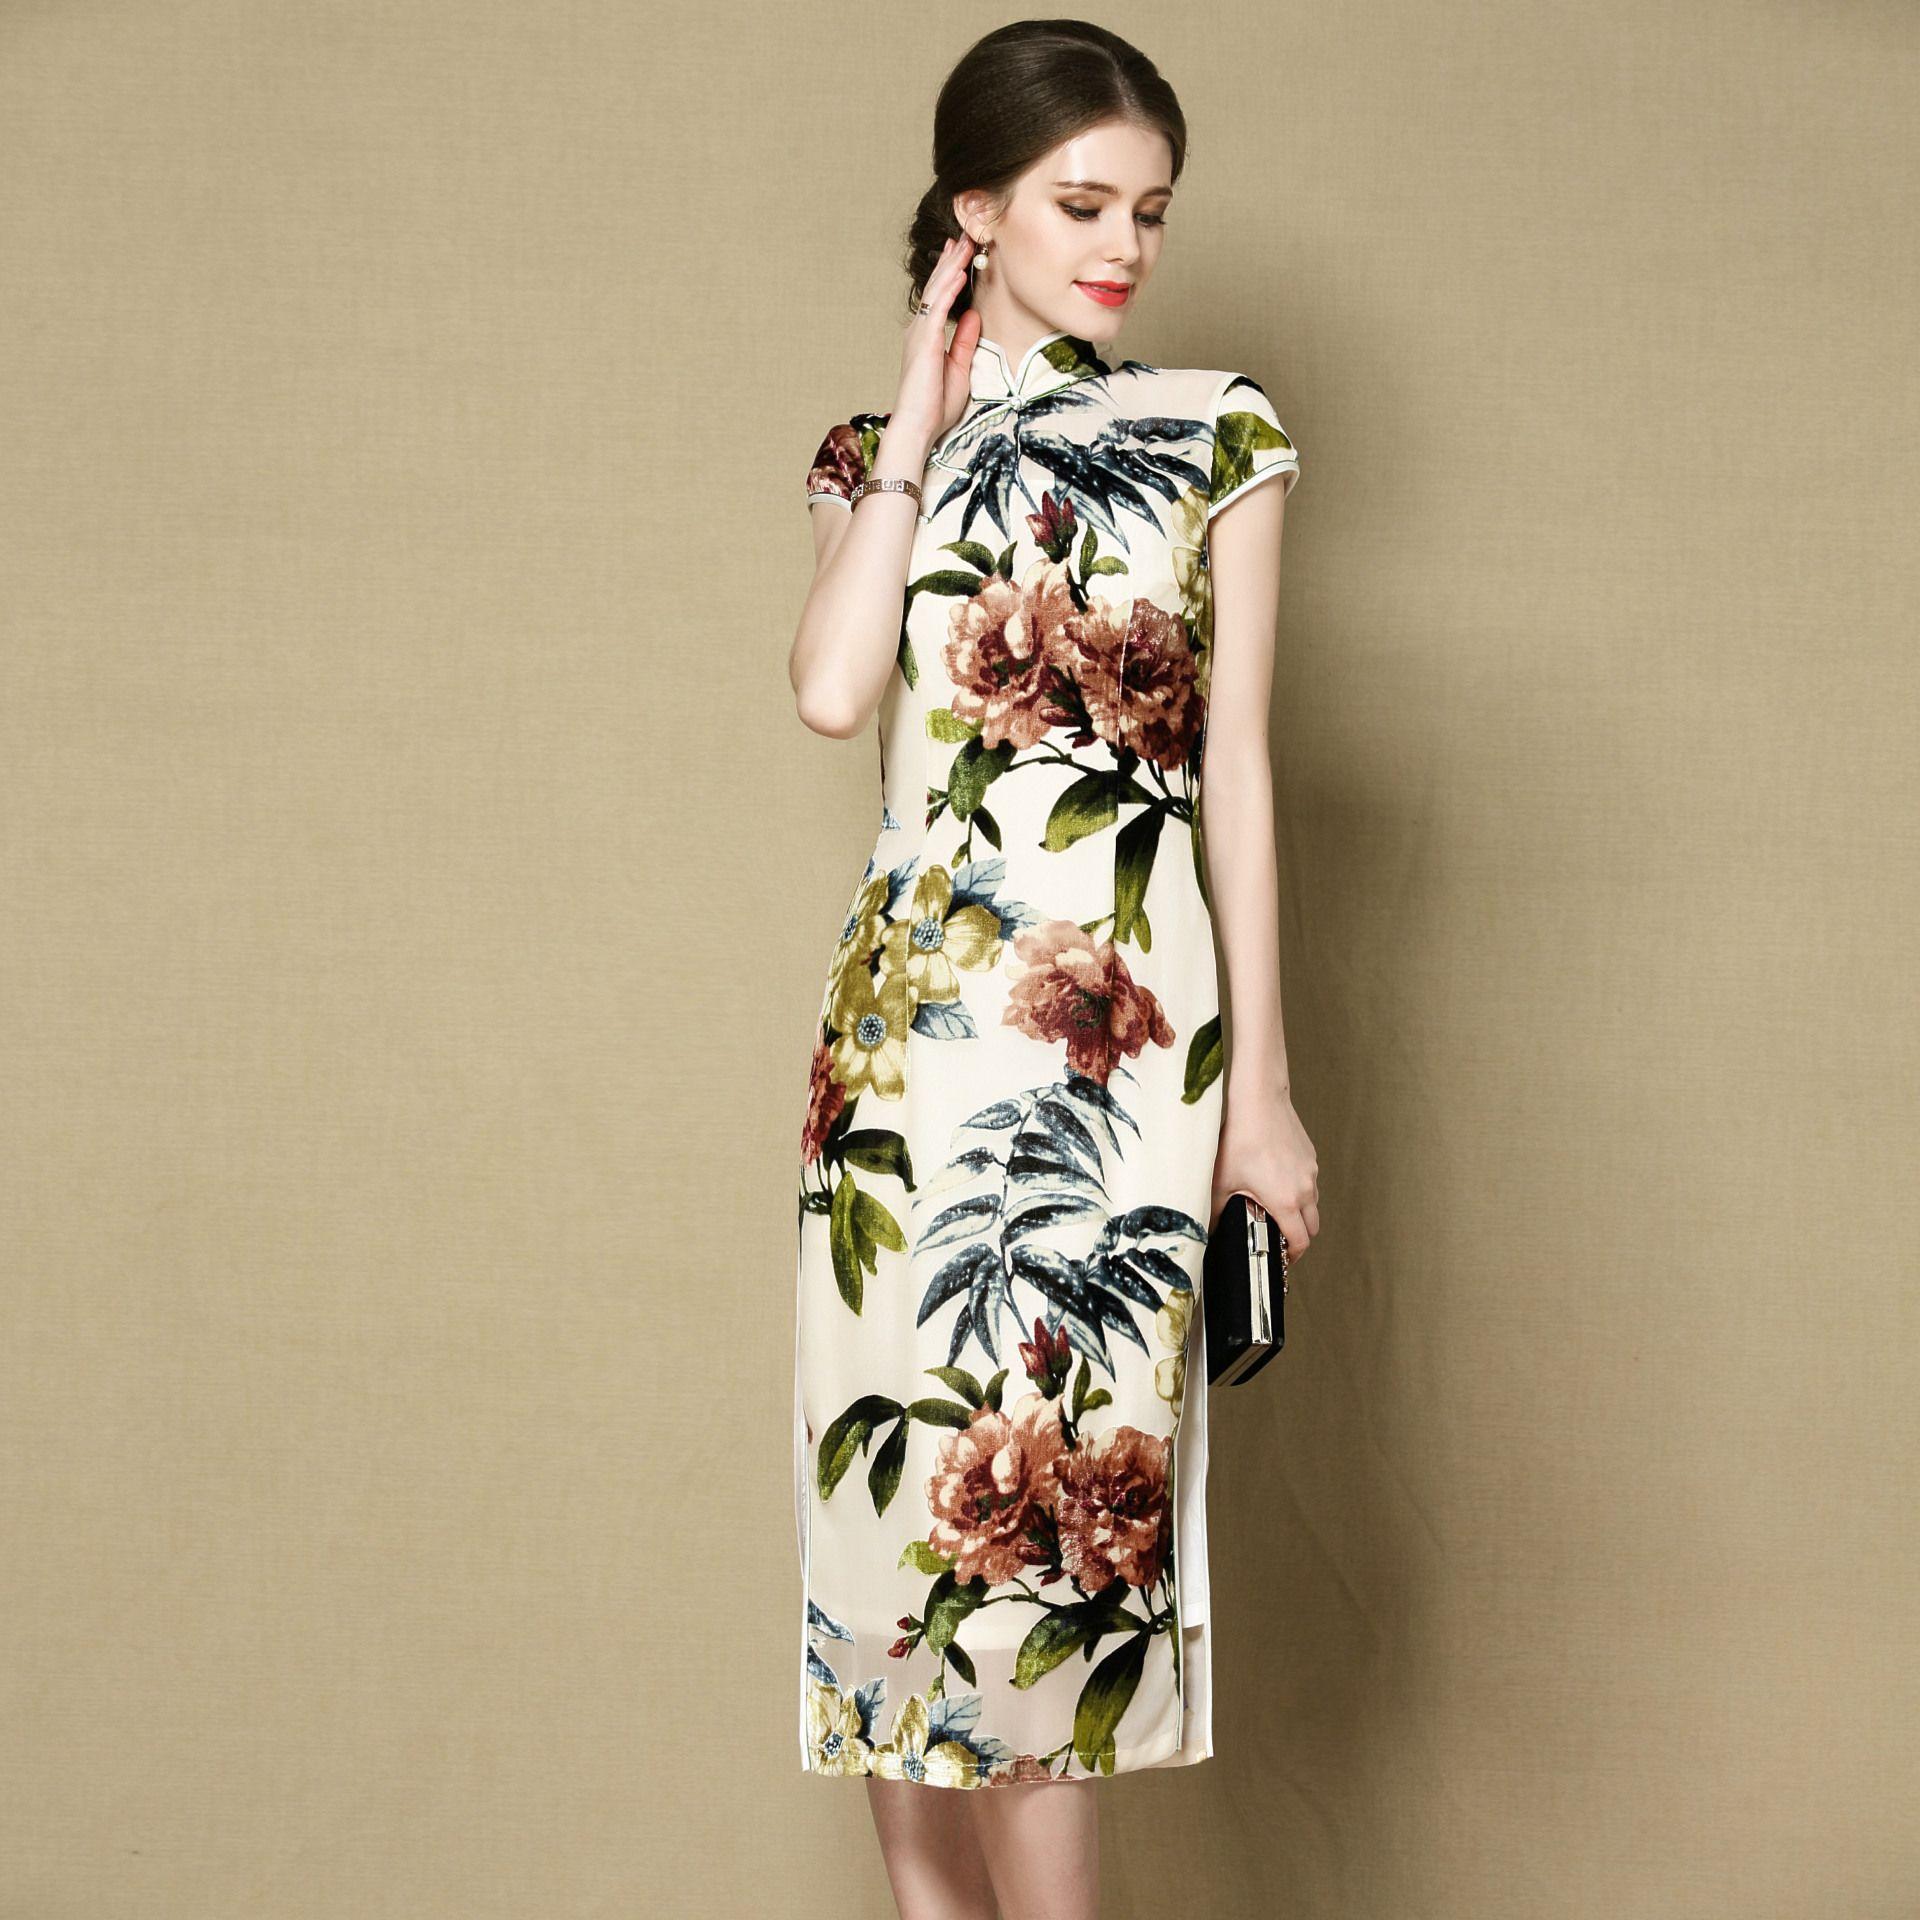 Winsome Floral Print Cap Sleeve Cheongsam Qipao Dress